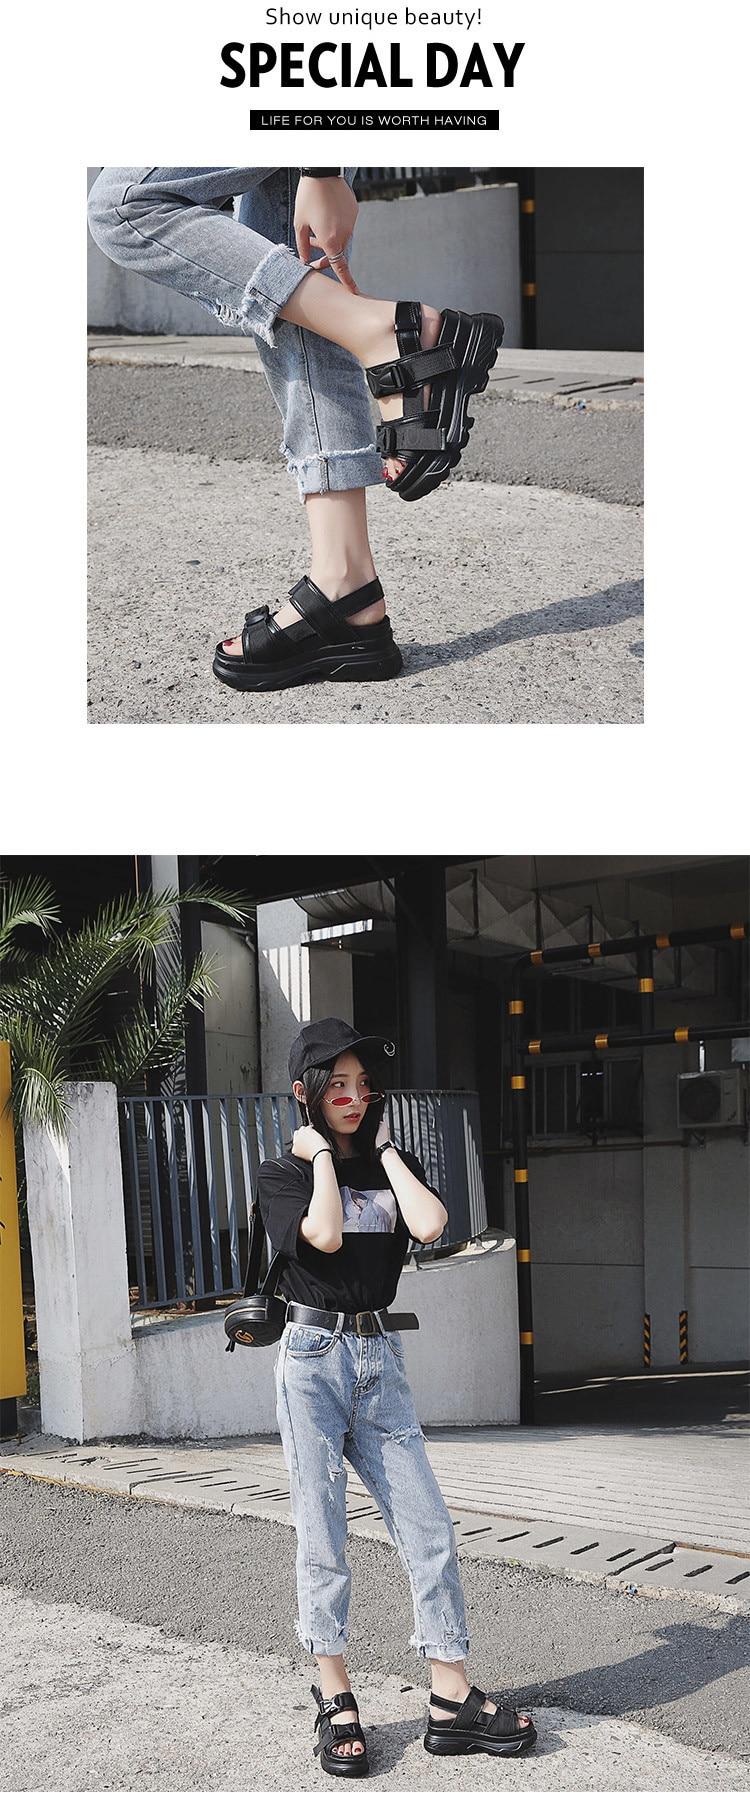 HTB1cbd.KCzqK1RjSZFLq6An2XXaL Summer Women Sandals Buckle Design Black White Platform Sandals Comfortable Women Thick Sole Beach Shoes 393w